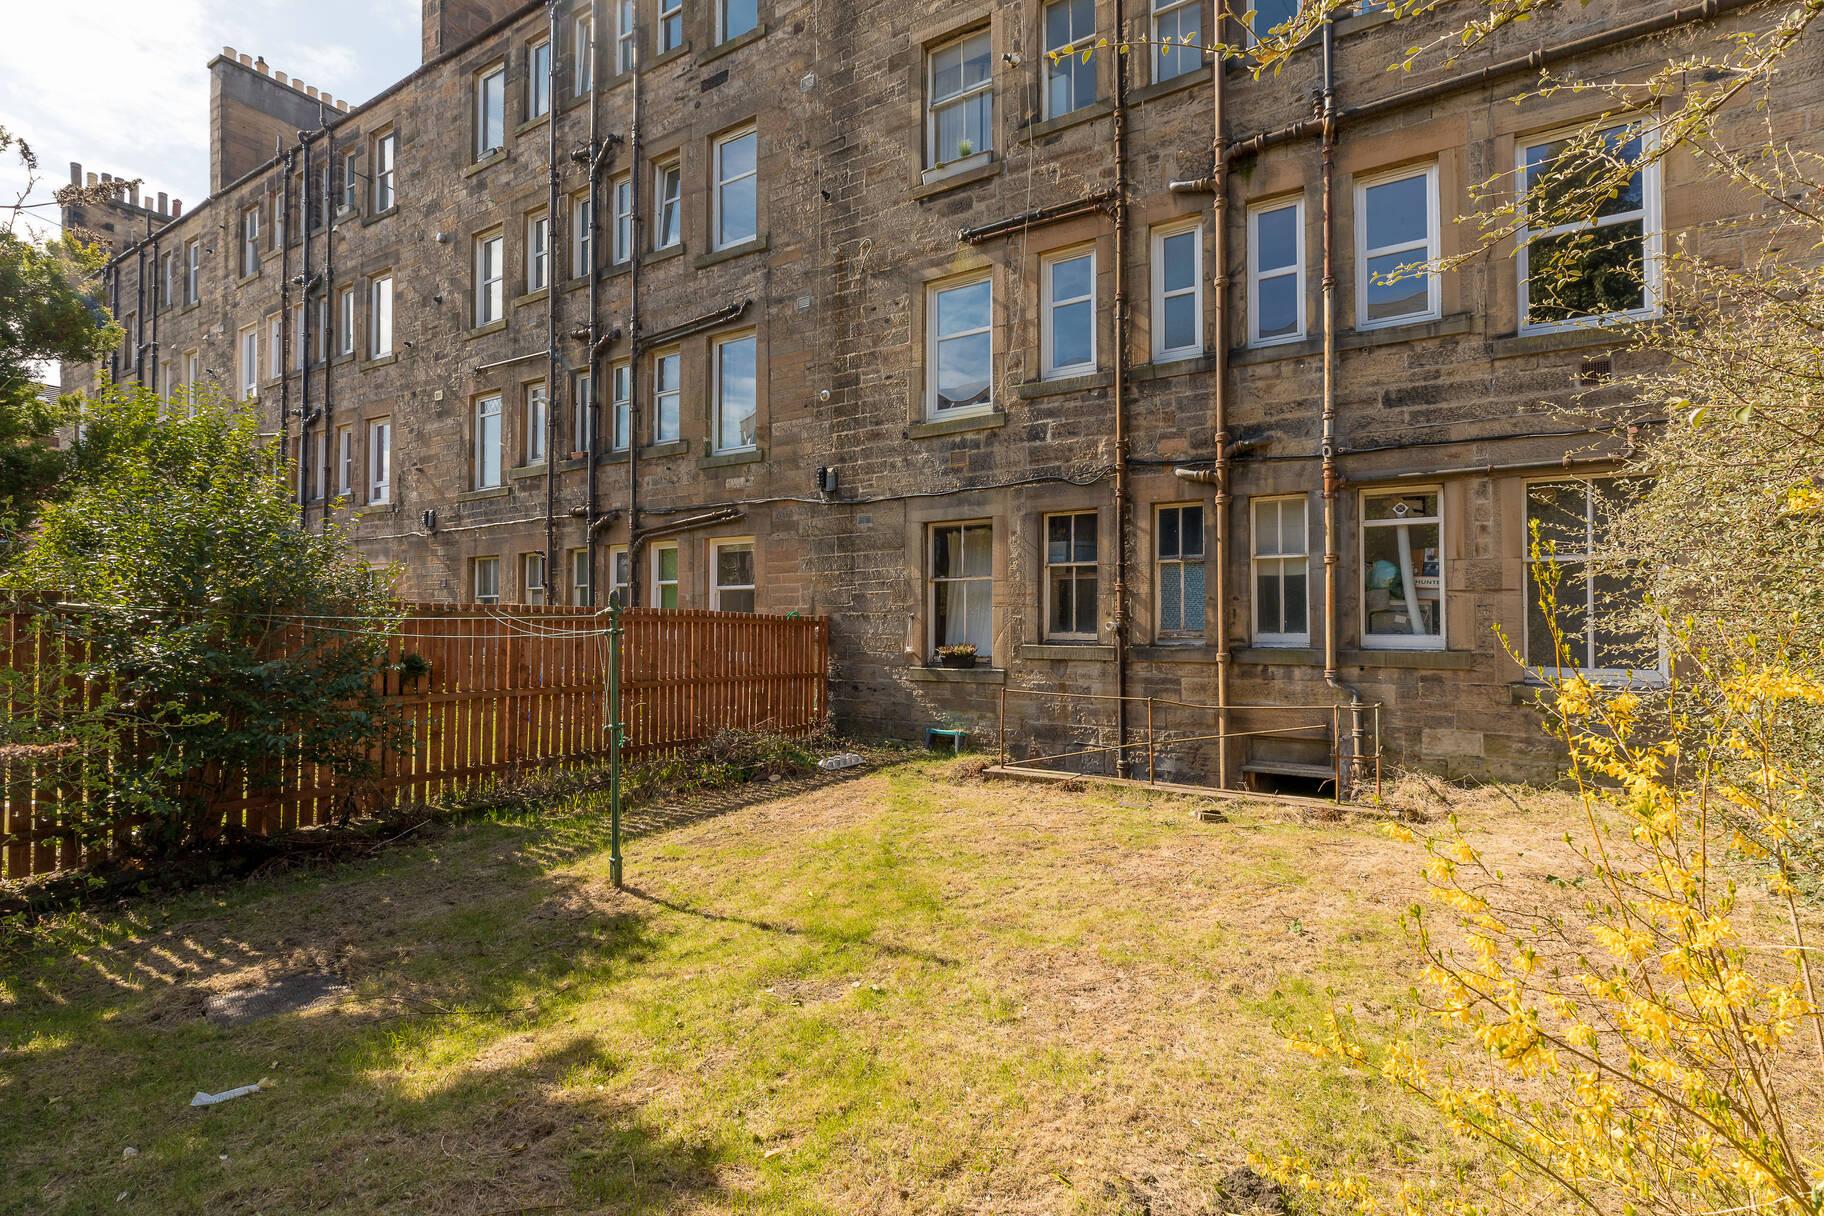 10/4 Hermand Terrace, Edinburgh, EH11 1QZ